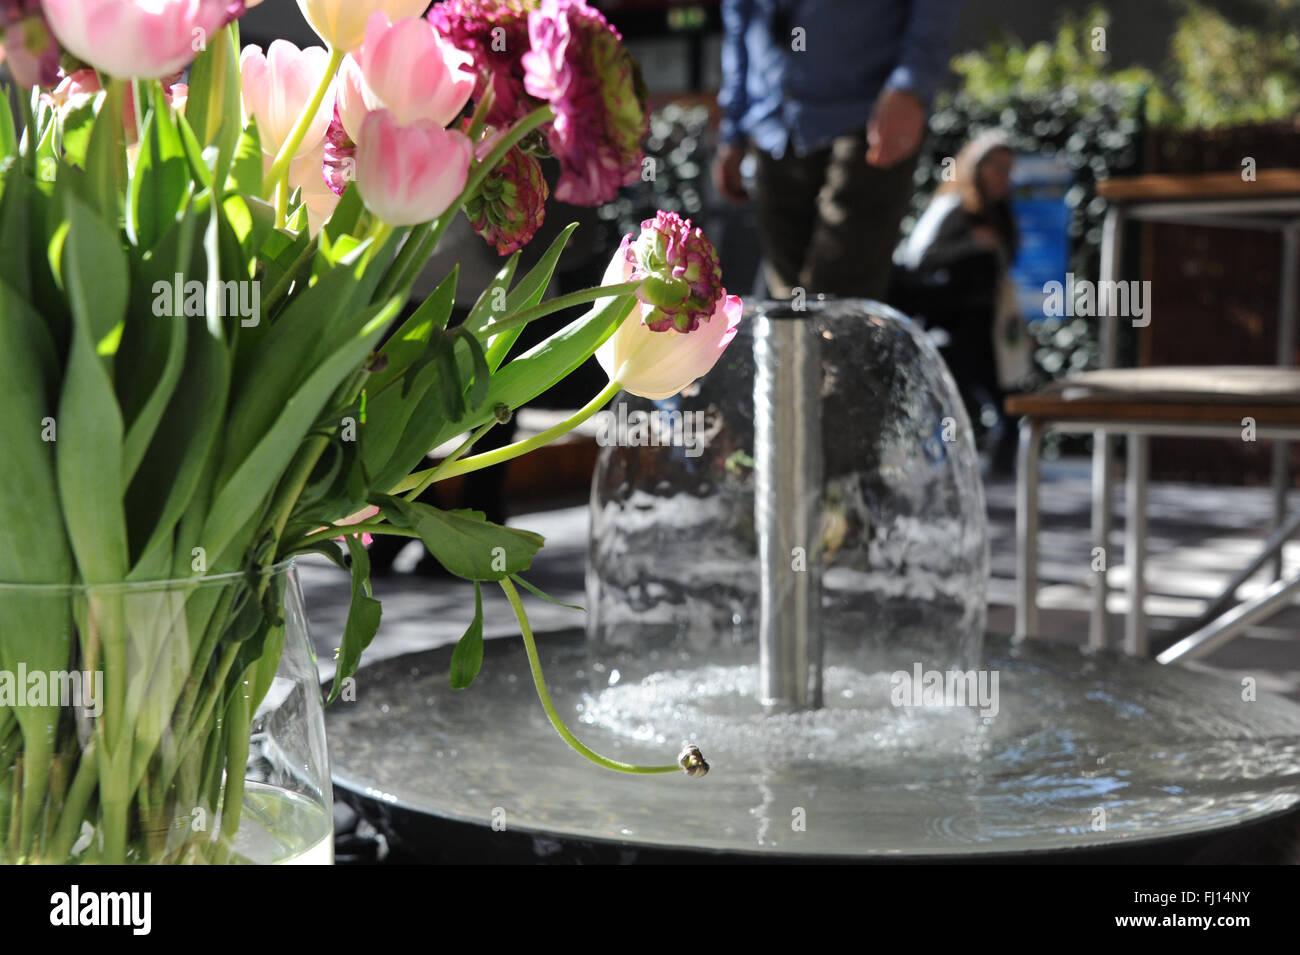 Munich, Germany. 26th Feb, 2016. A garden well and flowers cann be seen at the International Handcraft Fair IHM Stock Photo